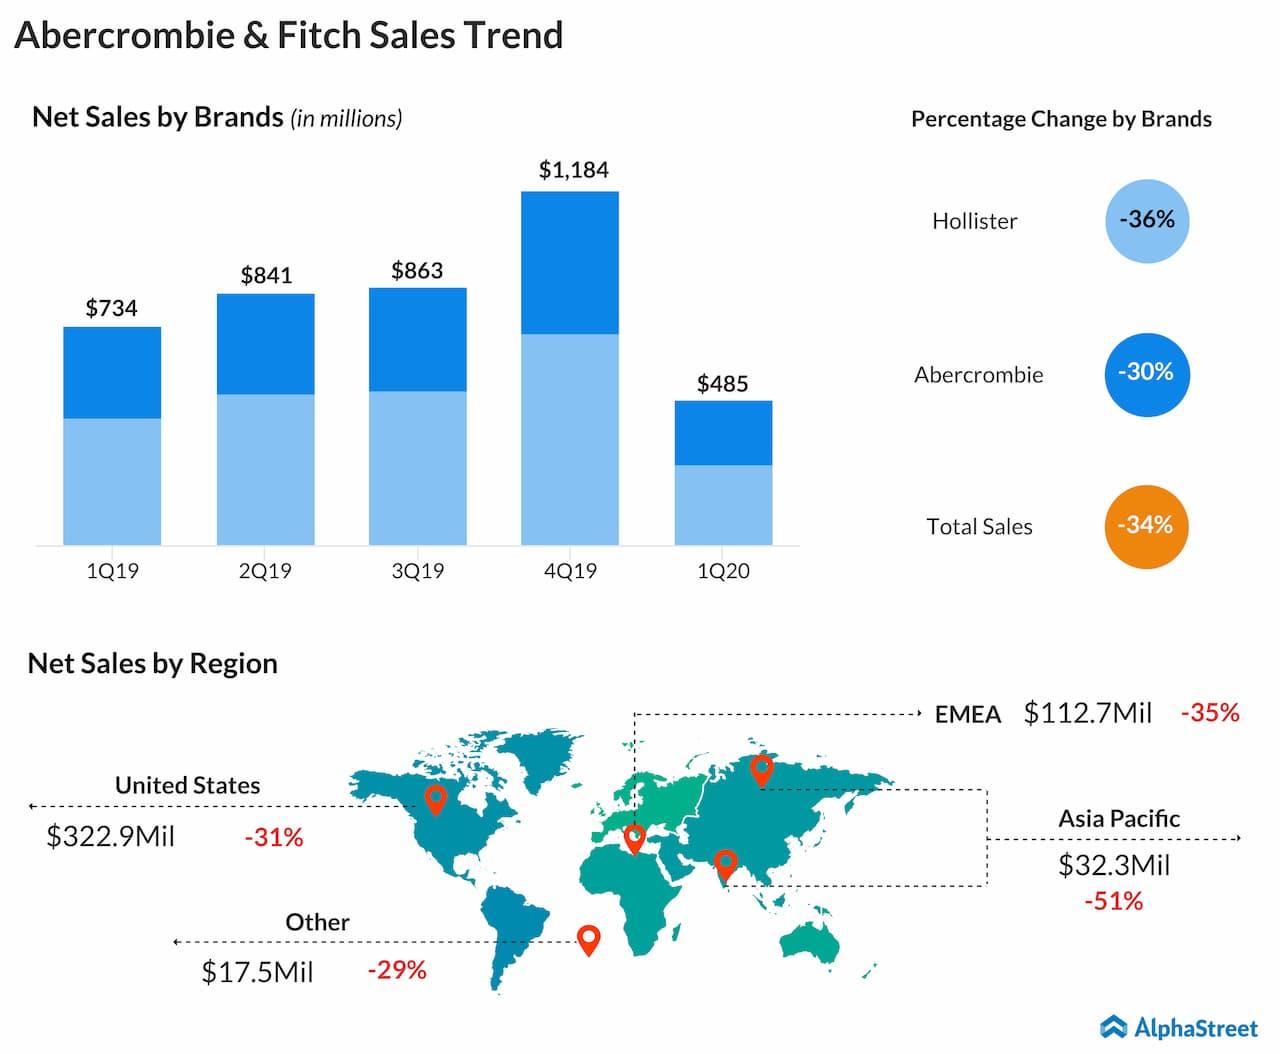 Abercrombie & Fitch Q1 2020 sales